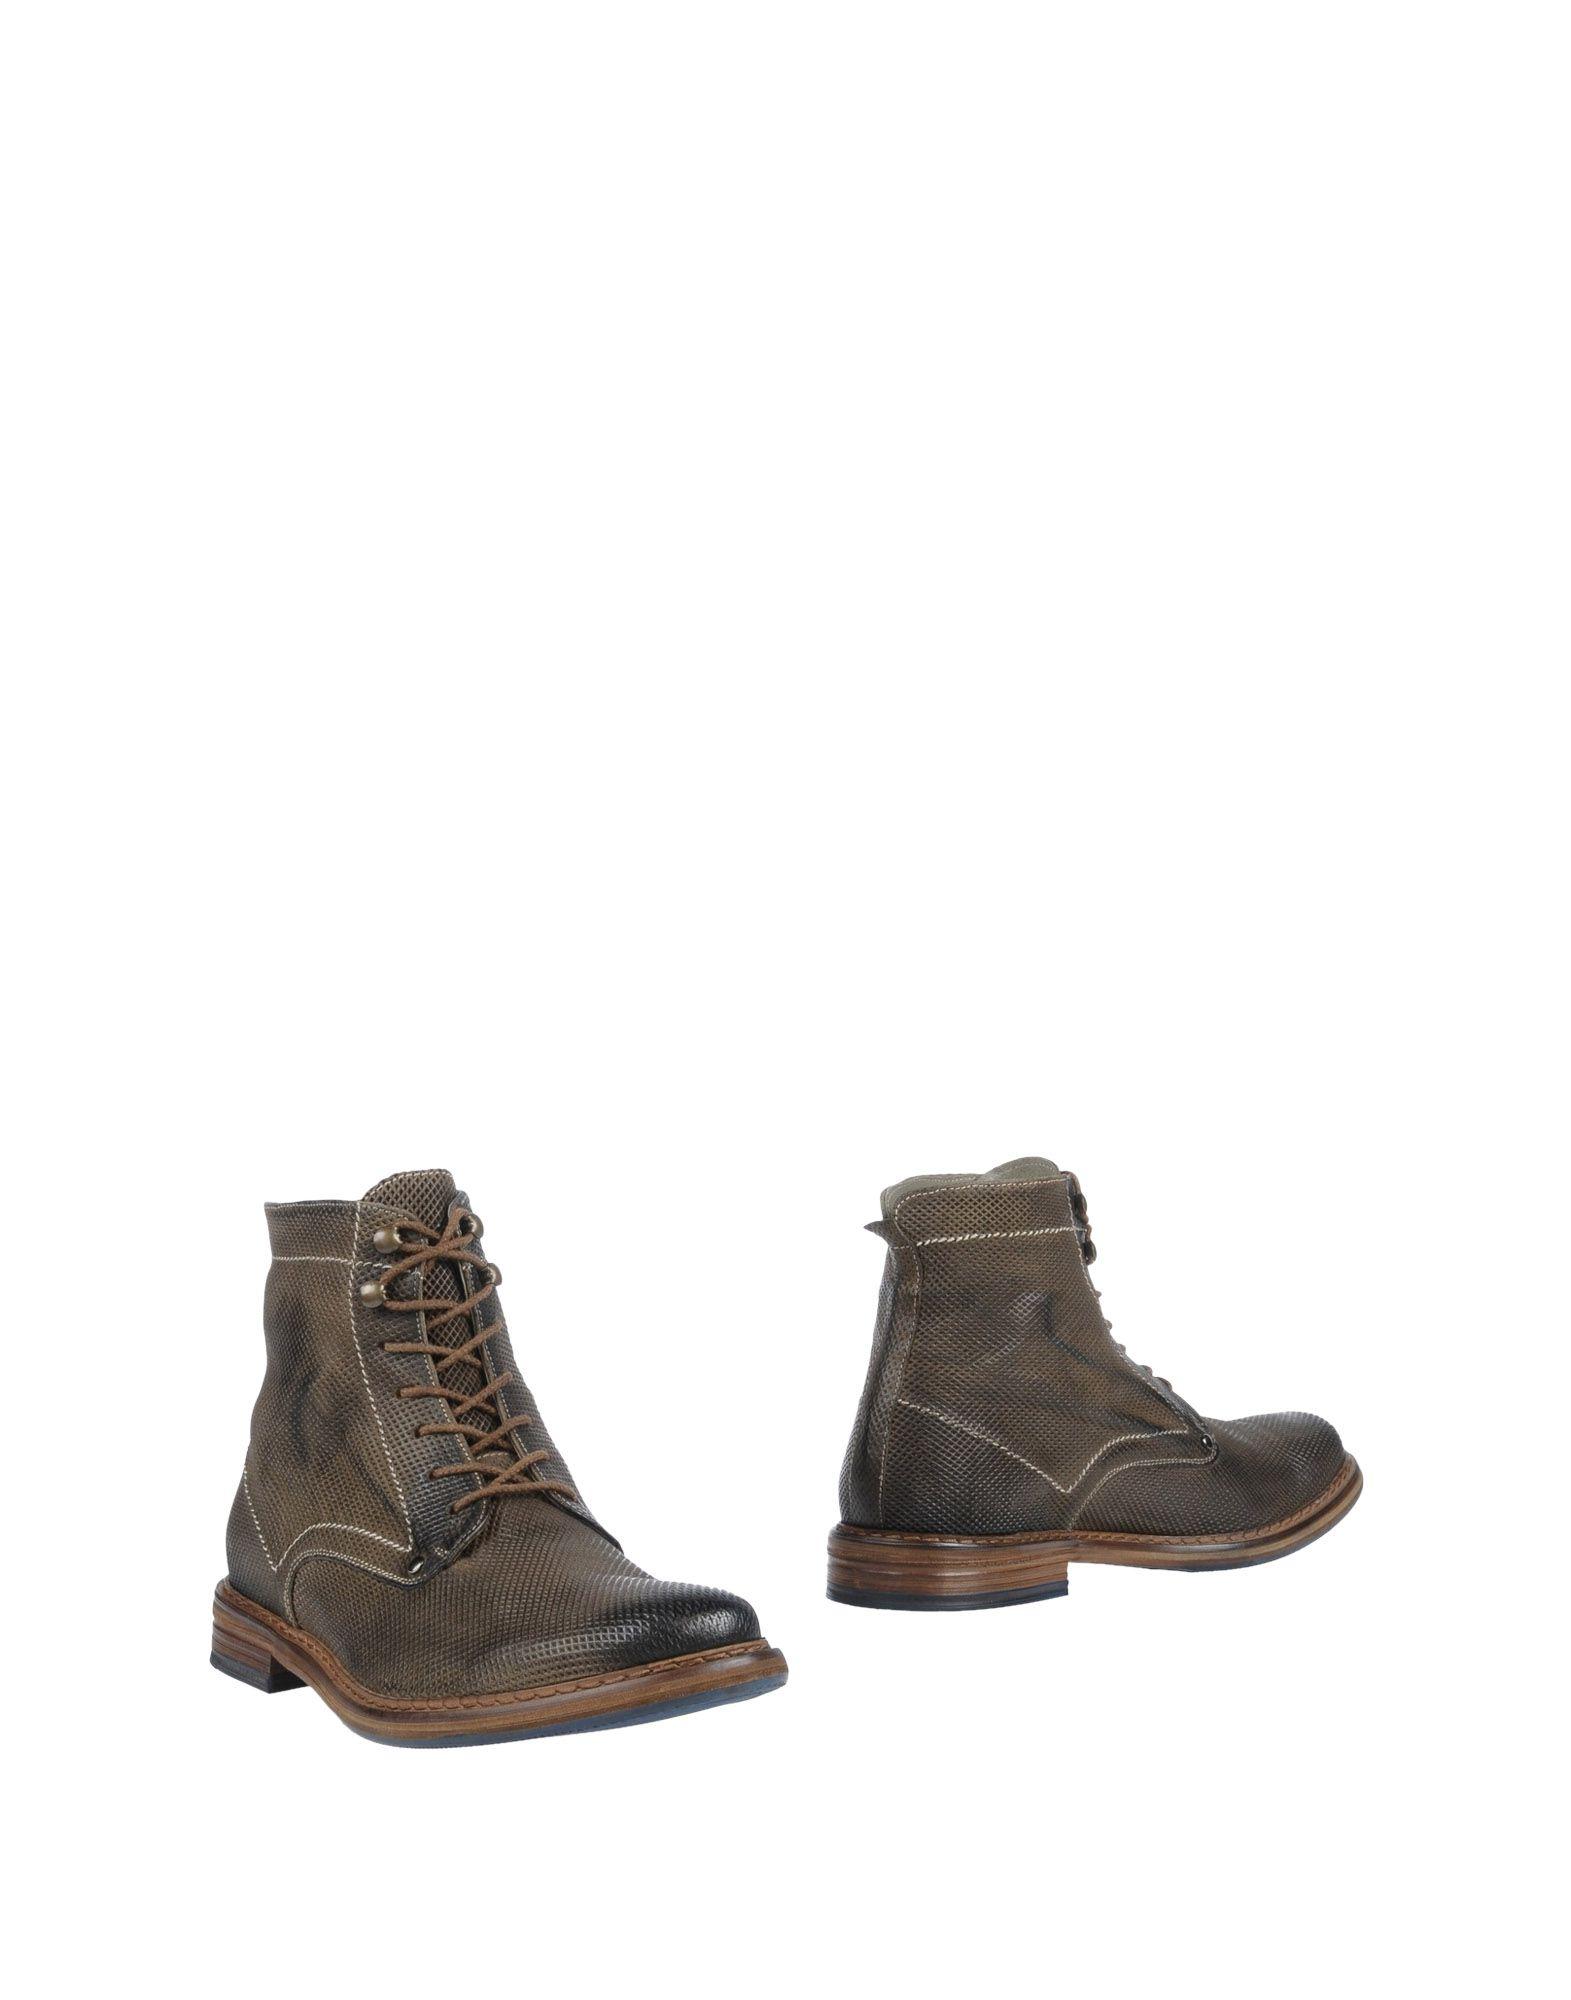 Jp/David Boots - on Men Jp/David Boots online on -  United Kingdom - 11506219QE cc1c1d